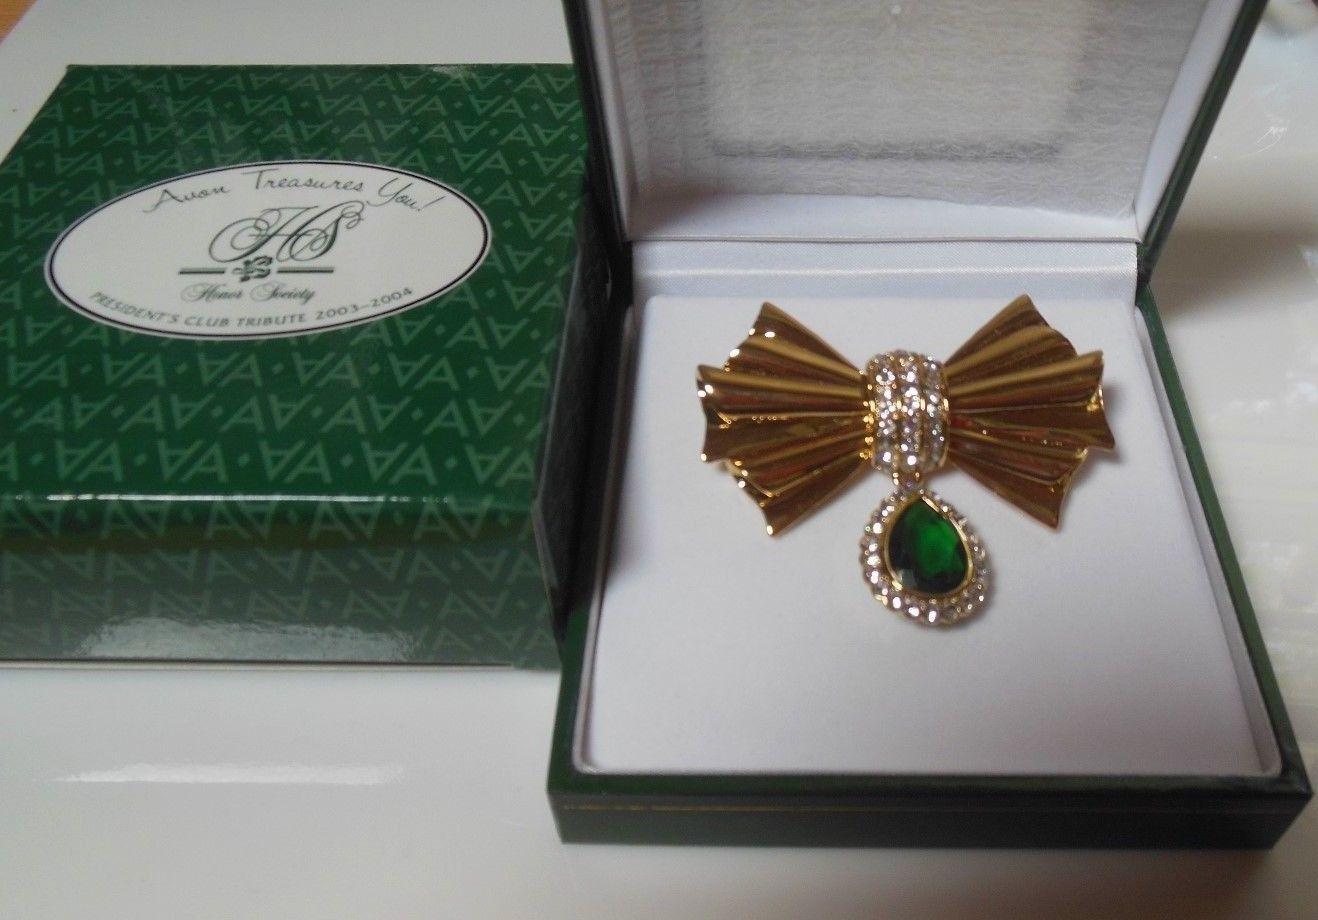 Avon President's Club Tribute Honor Society Brilliant Treasures Pin 2003-2004